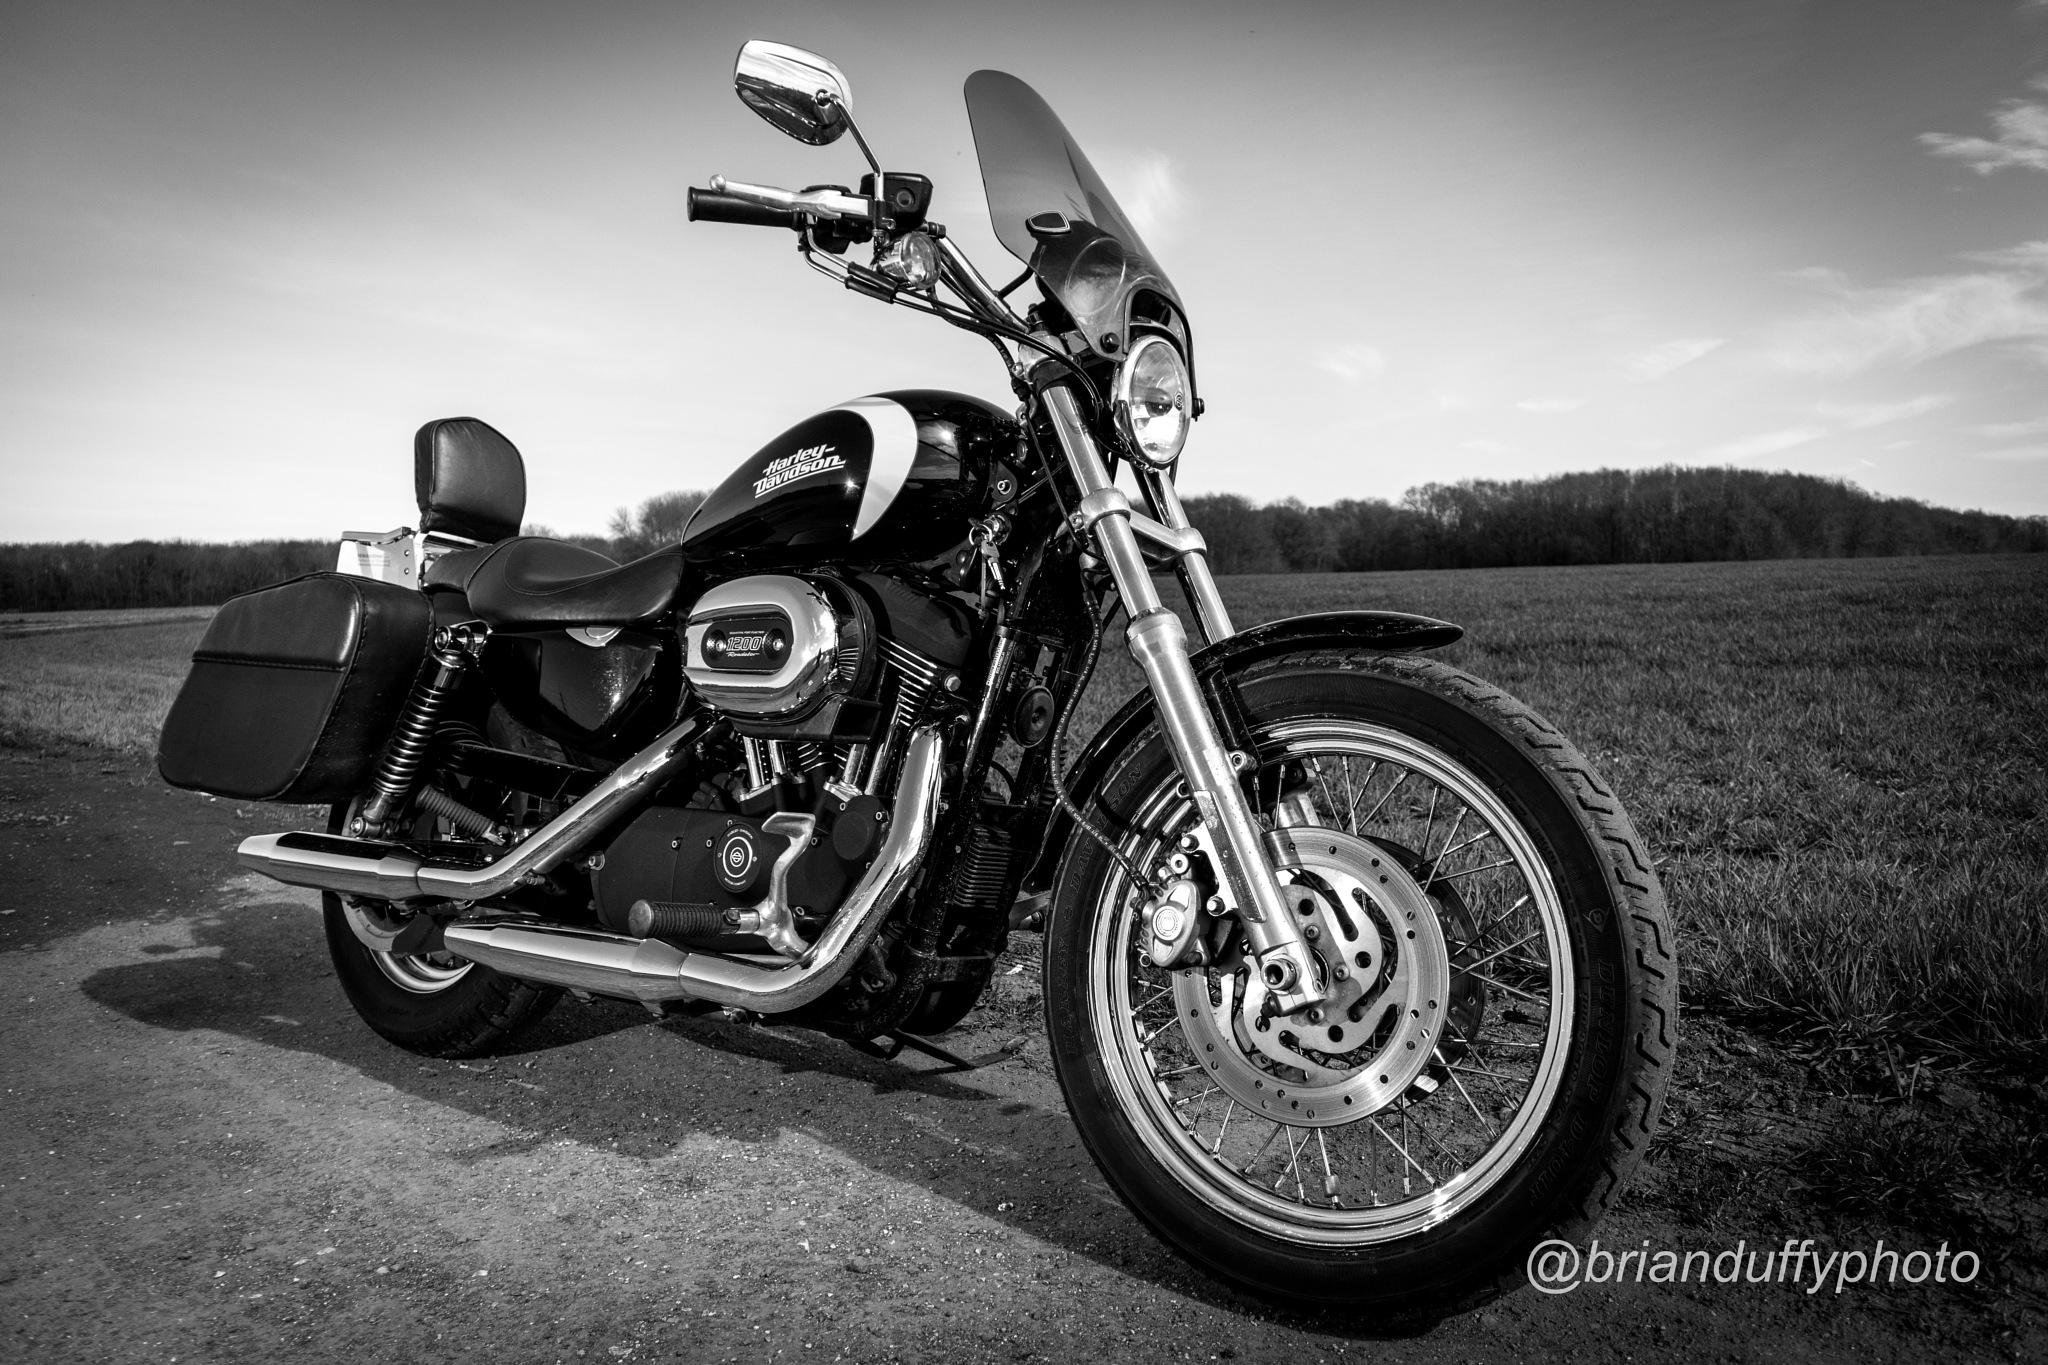 Harley Davidson XL1200R Roadster by BrianDuffyPhoto